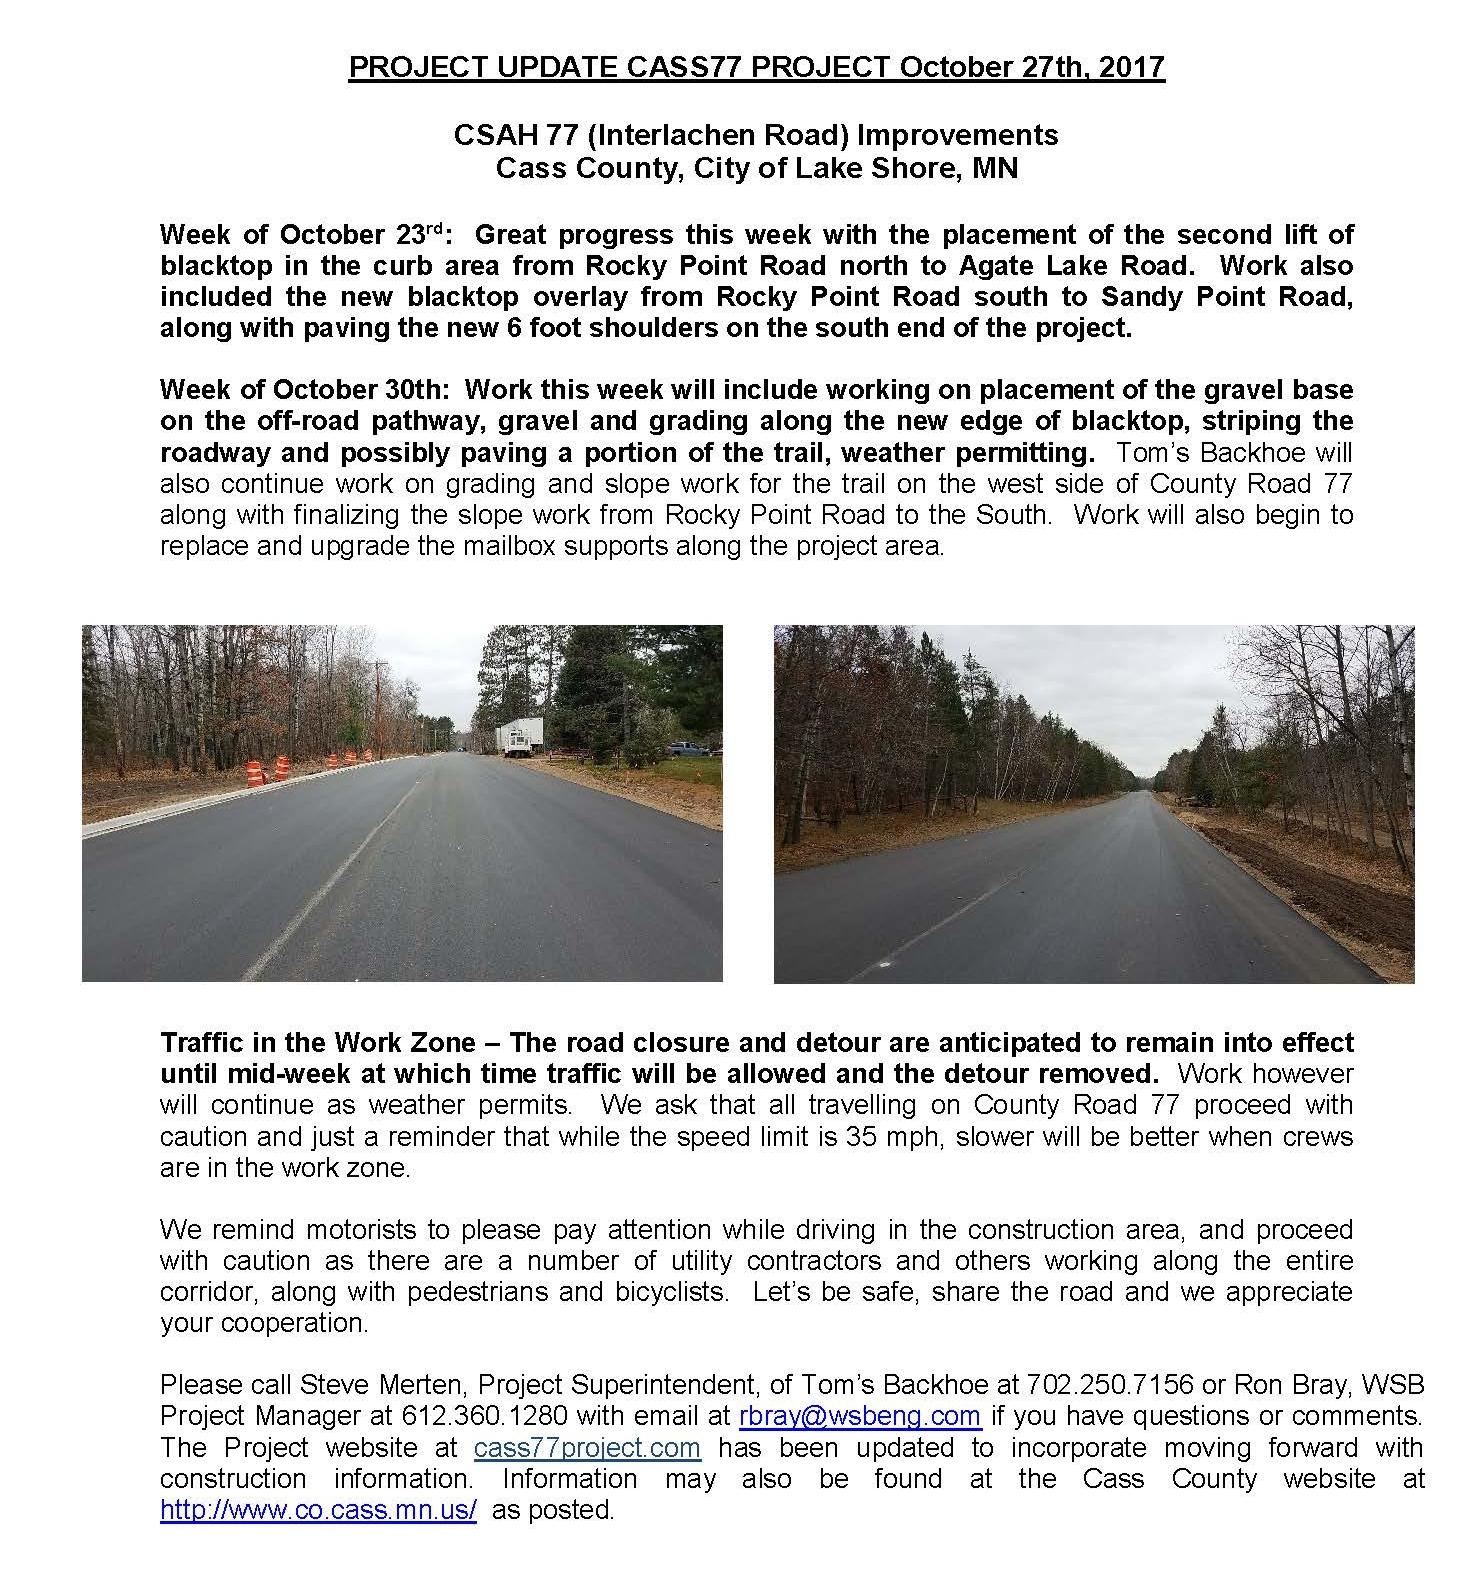 Cass County CSAH 77 Project update October 27th 2017 (002).jpg